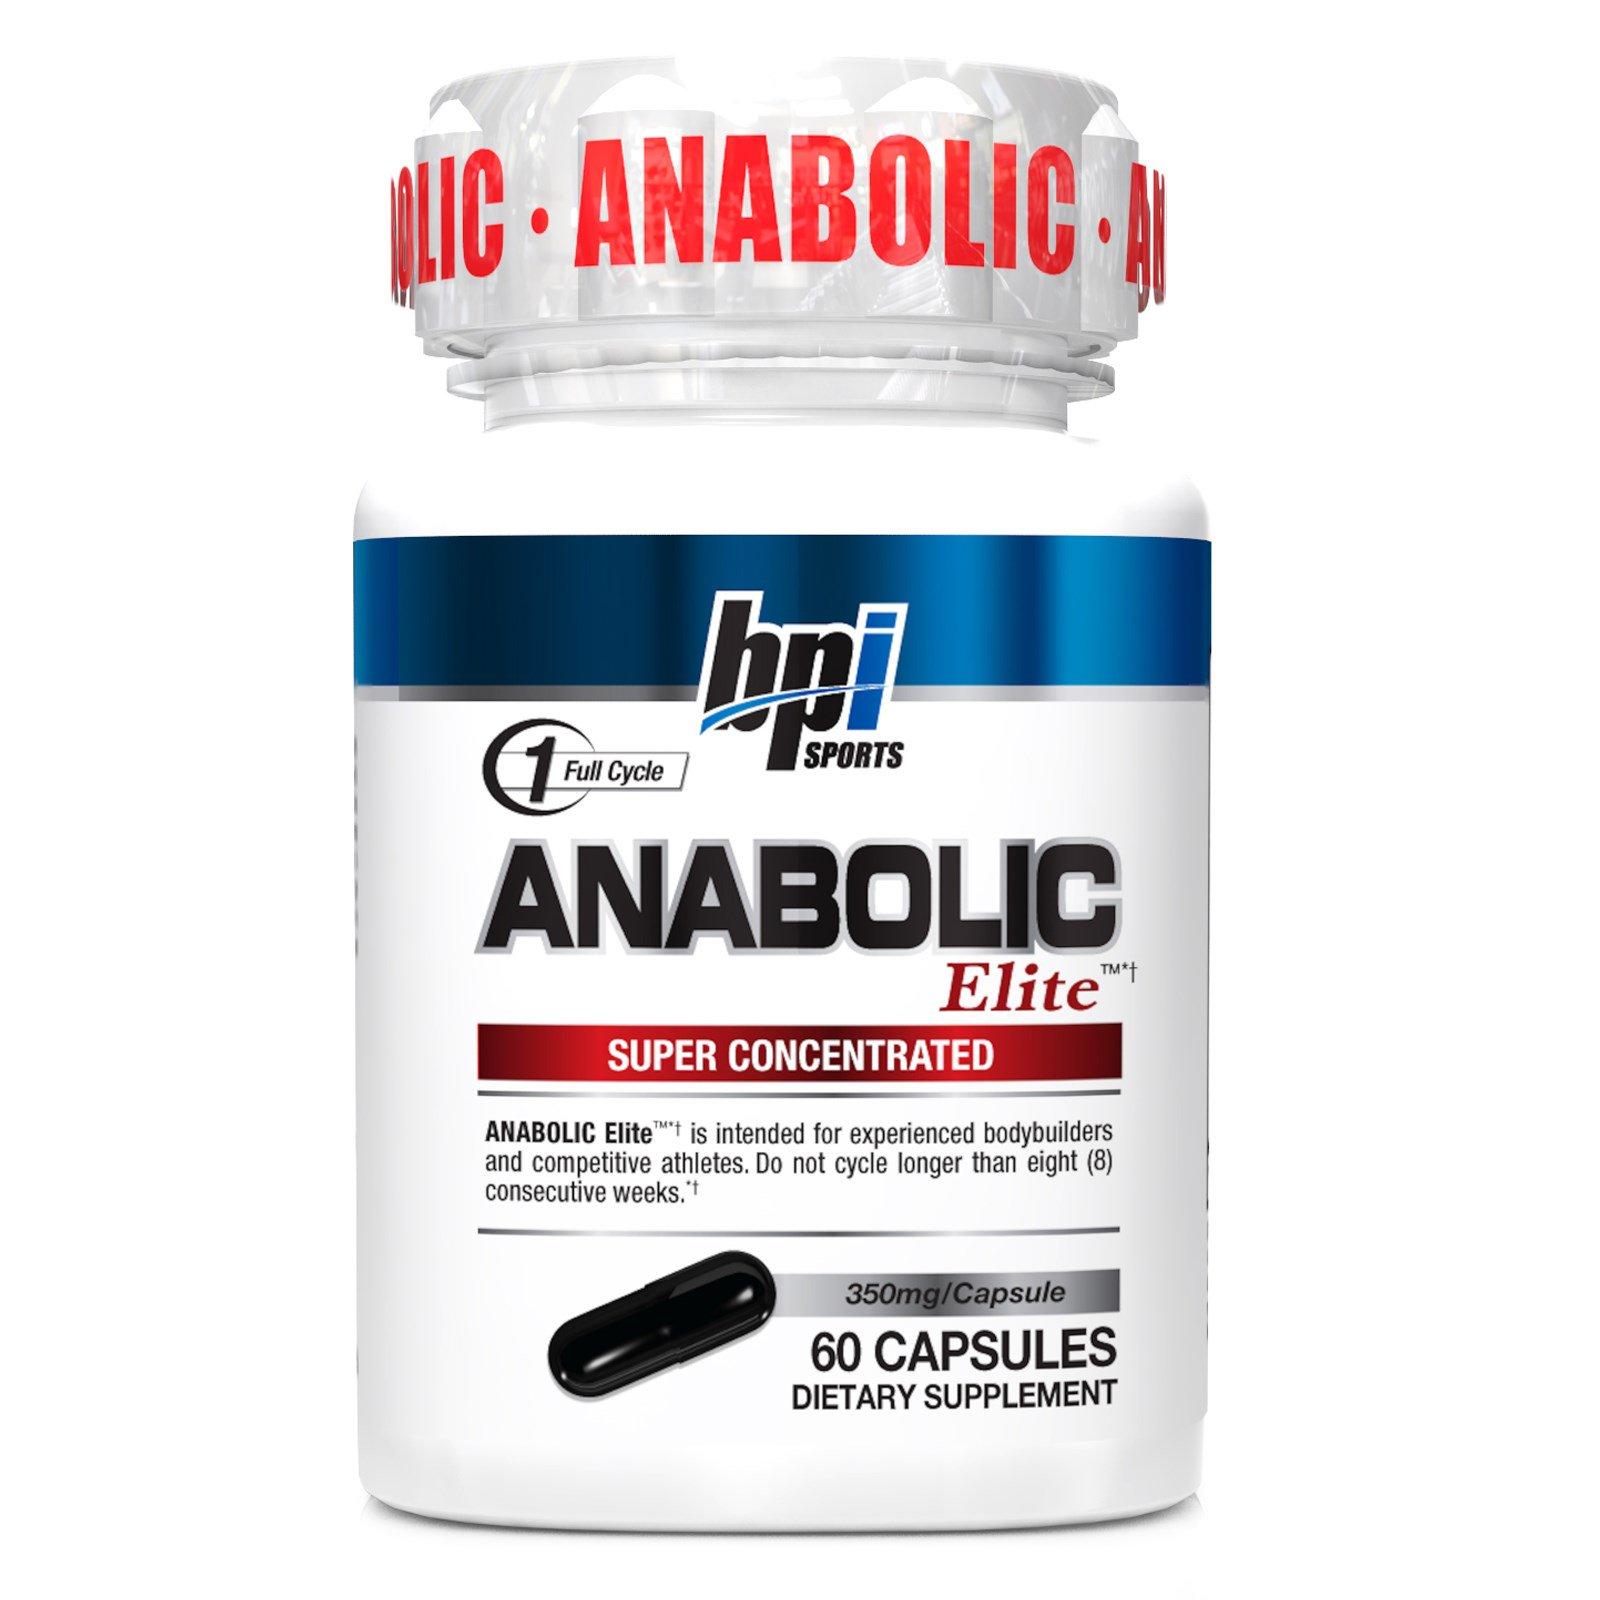 bpi anabolic elite what does it do